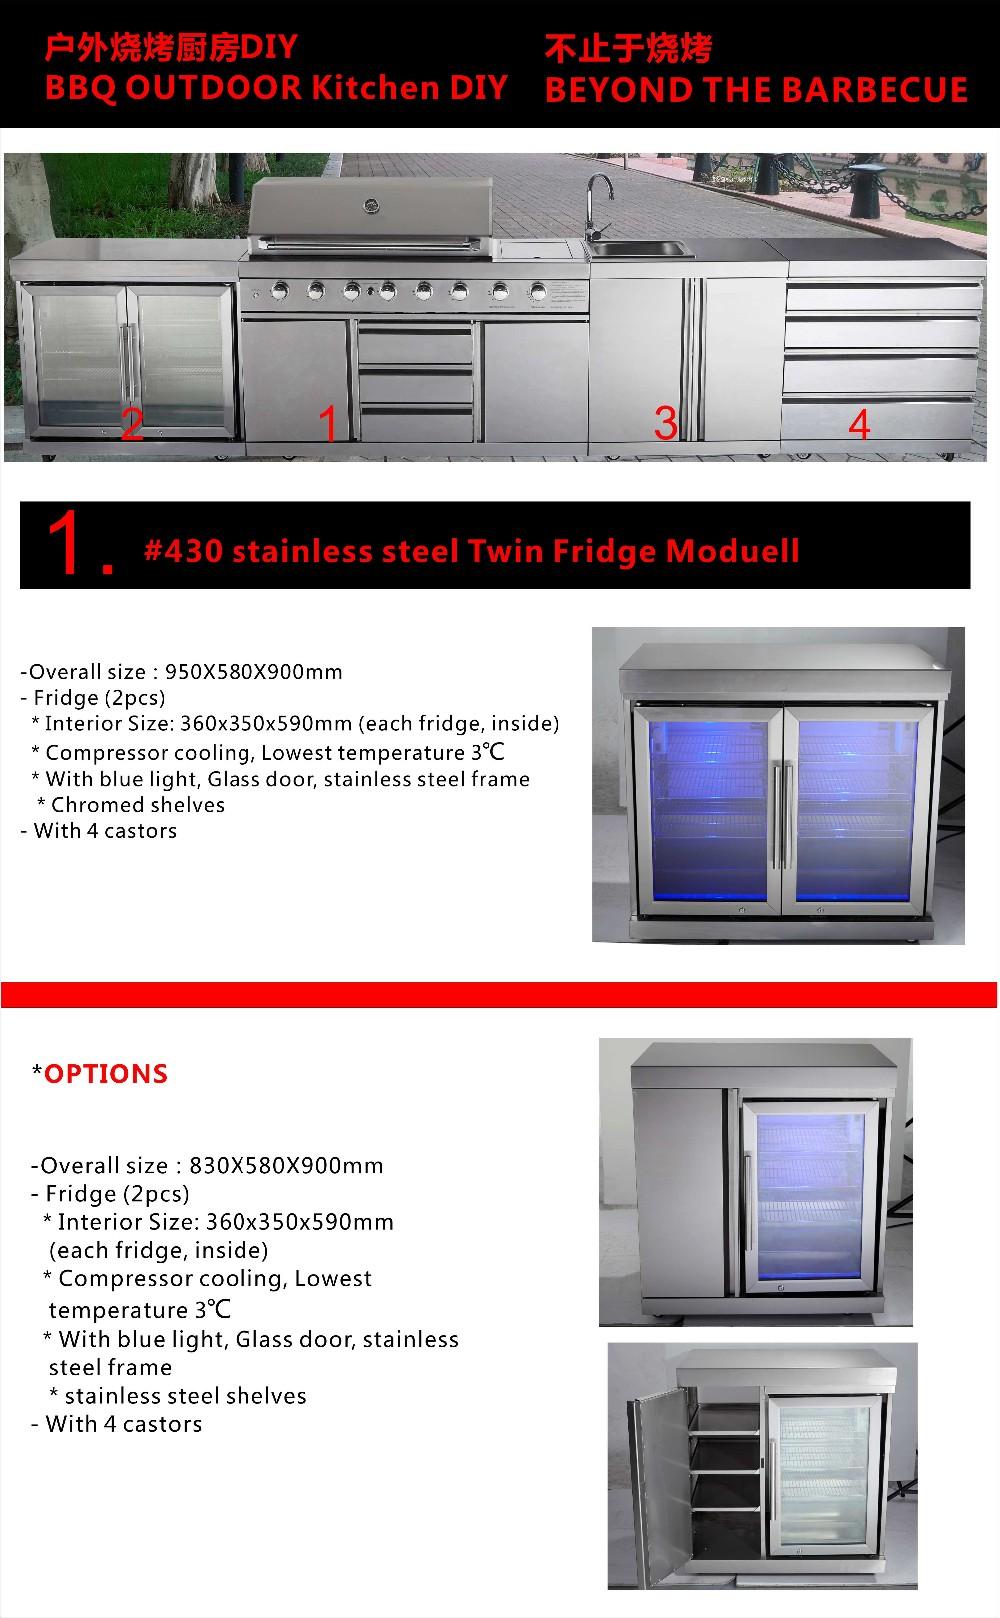 edelstahl outdoor grill küche-wandschrank-produkt id:60319850336